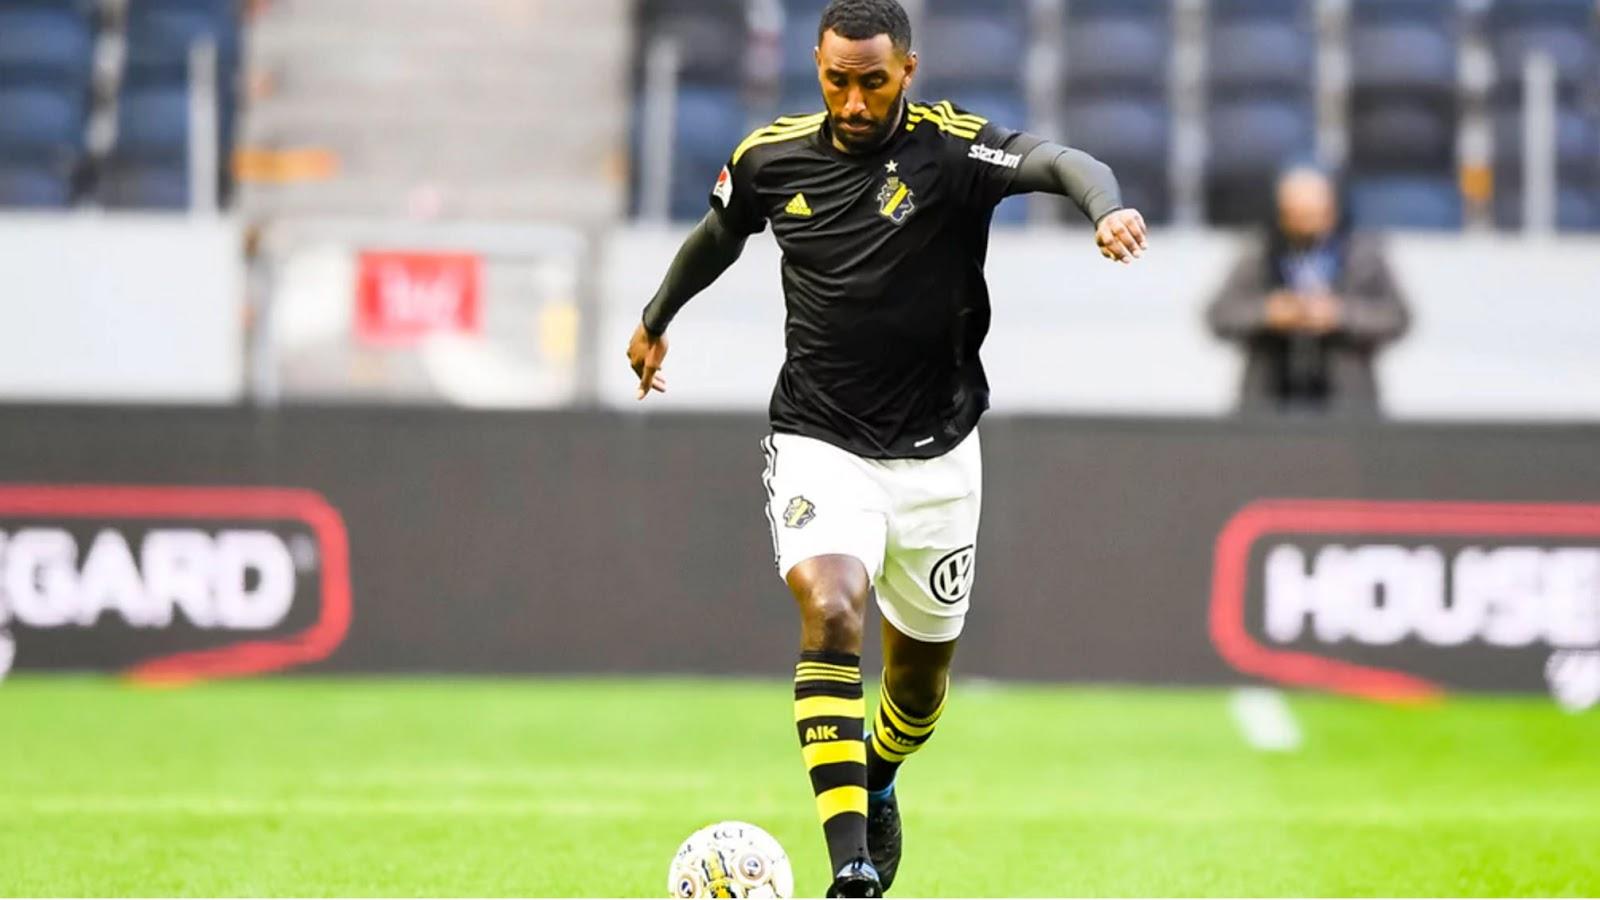 <Eritrean National team player Henok Goitomscores for AIK. Alexander Isak Scores for Sweden under 19.